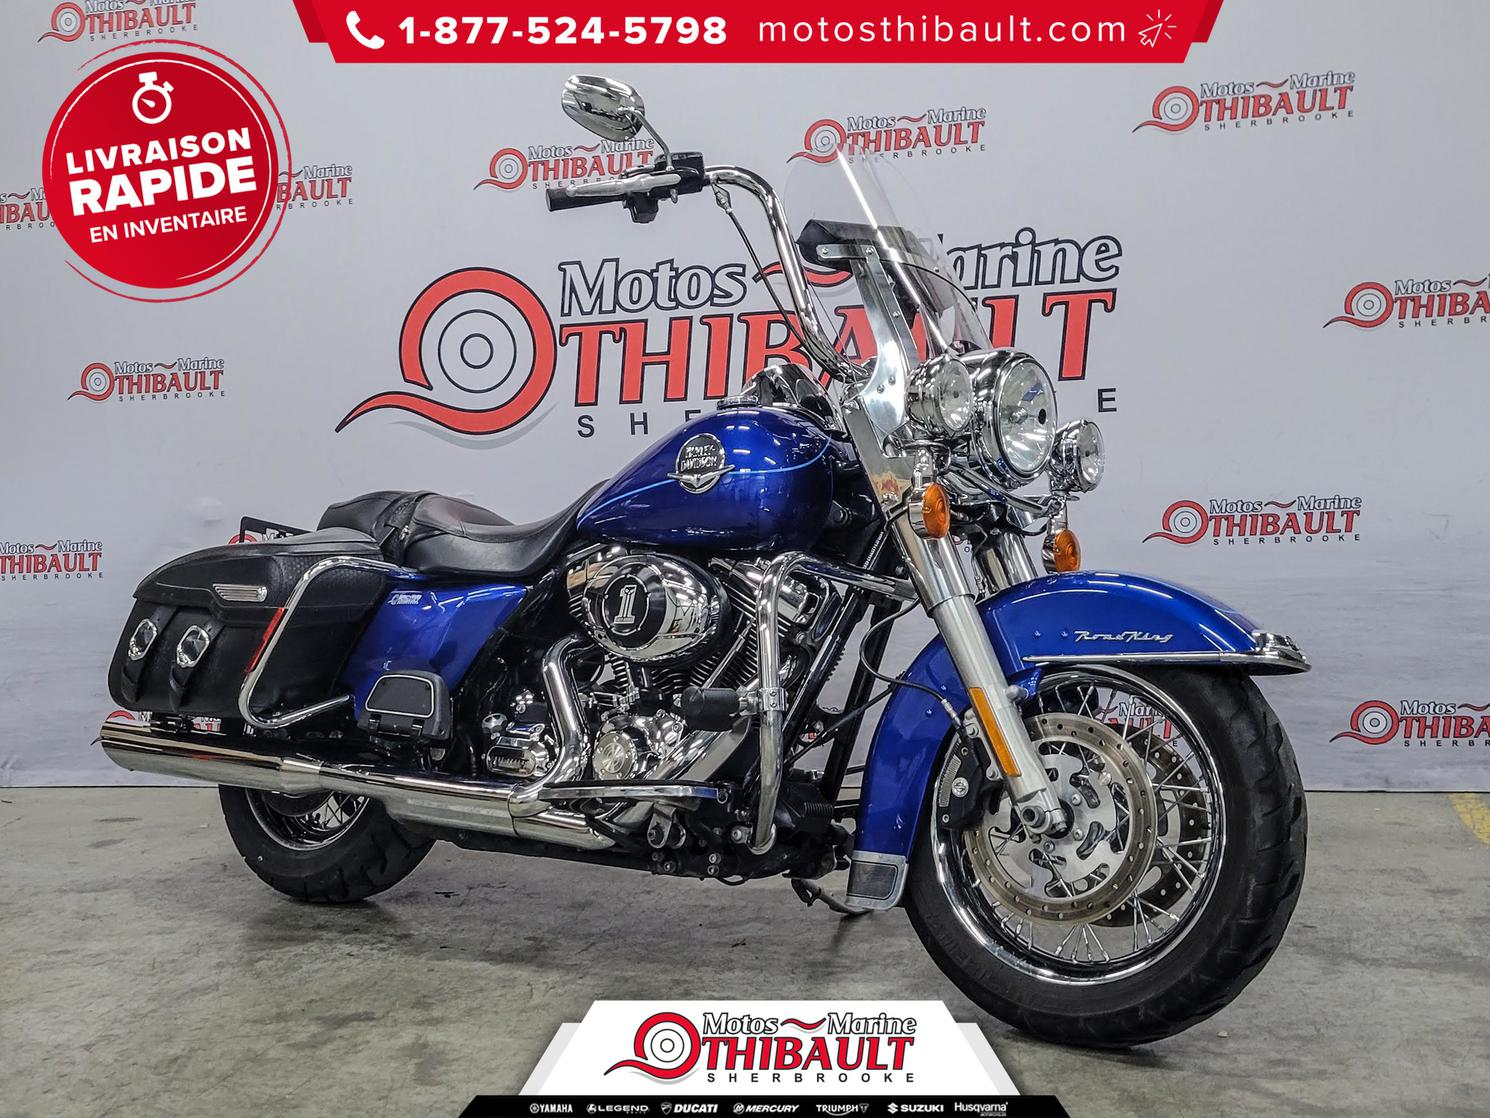 2009 Harley-Davidson FLHRC Road King Classic